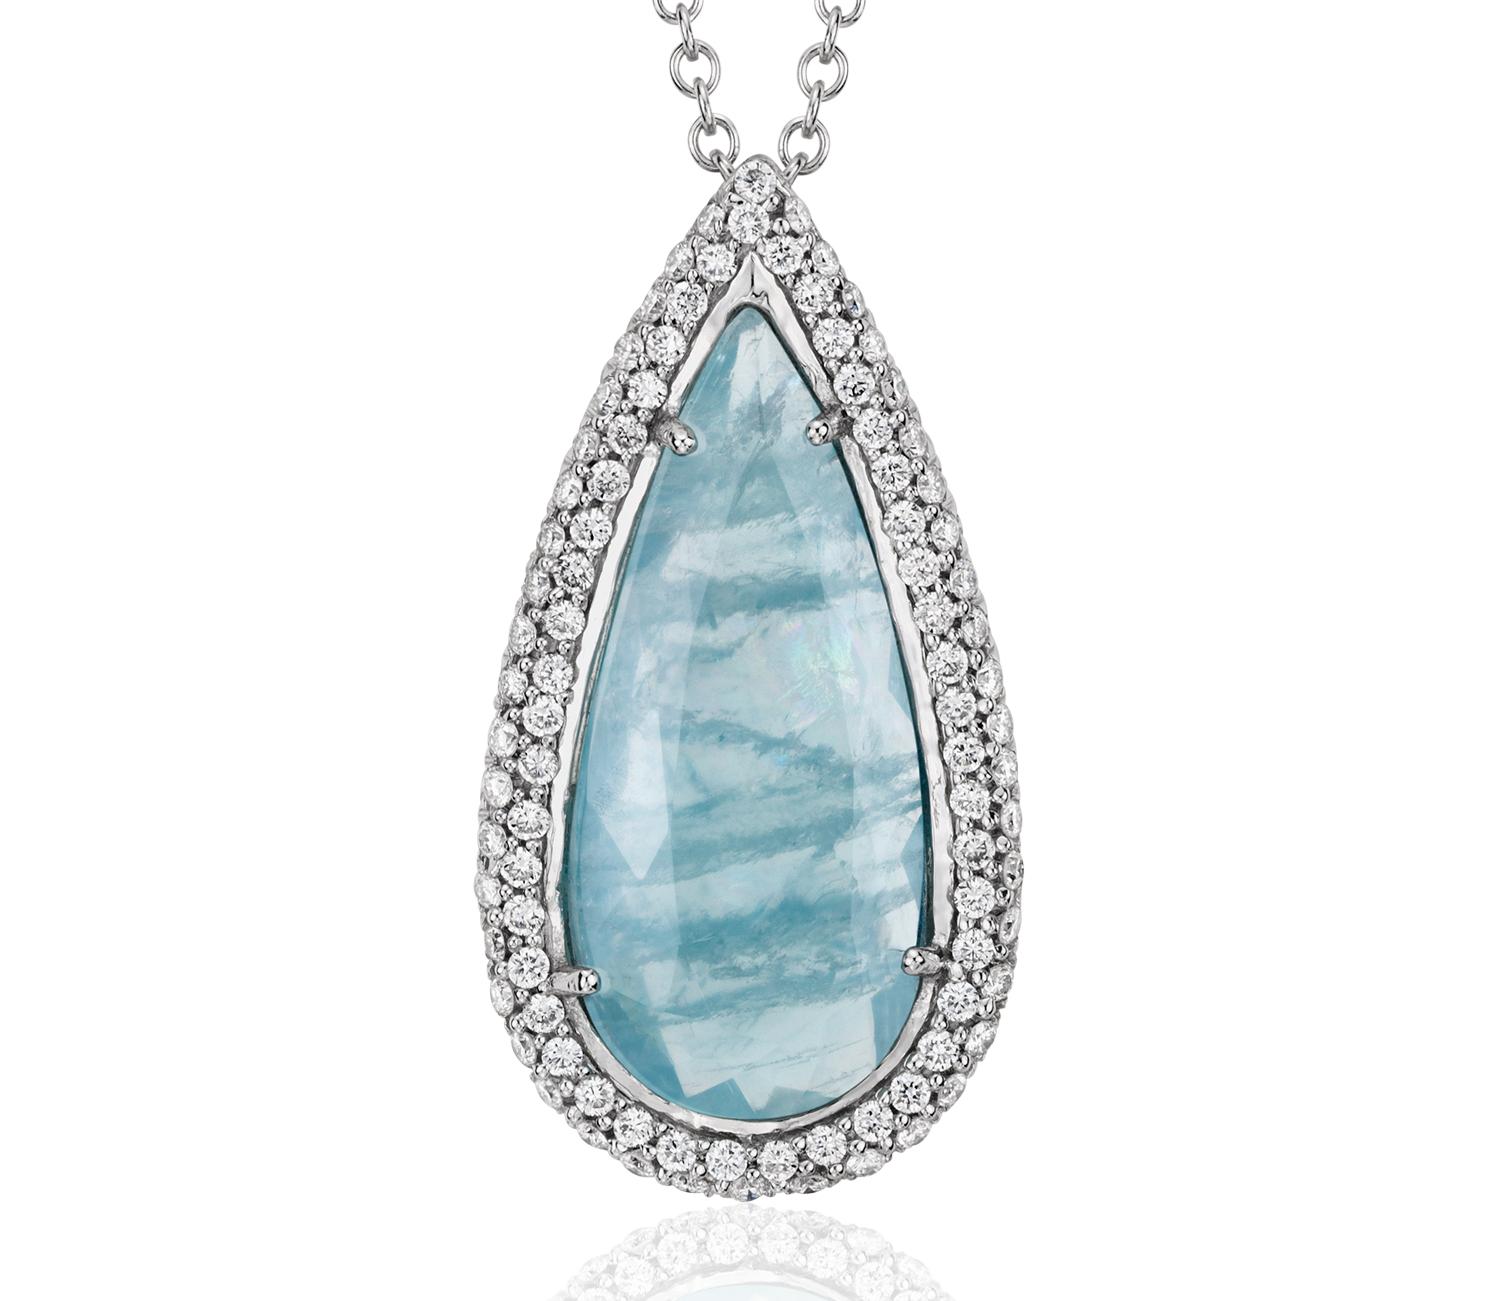 Pendentif en diamants sertis micro-pavé et aigue-marine en or blanc 18carats